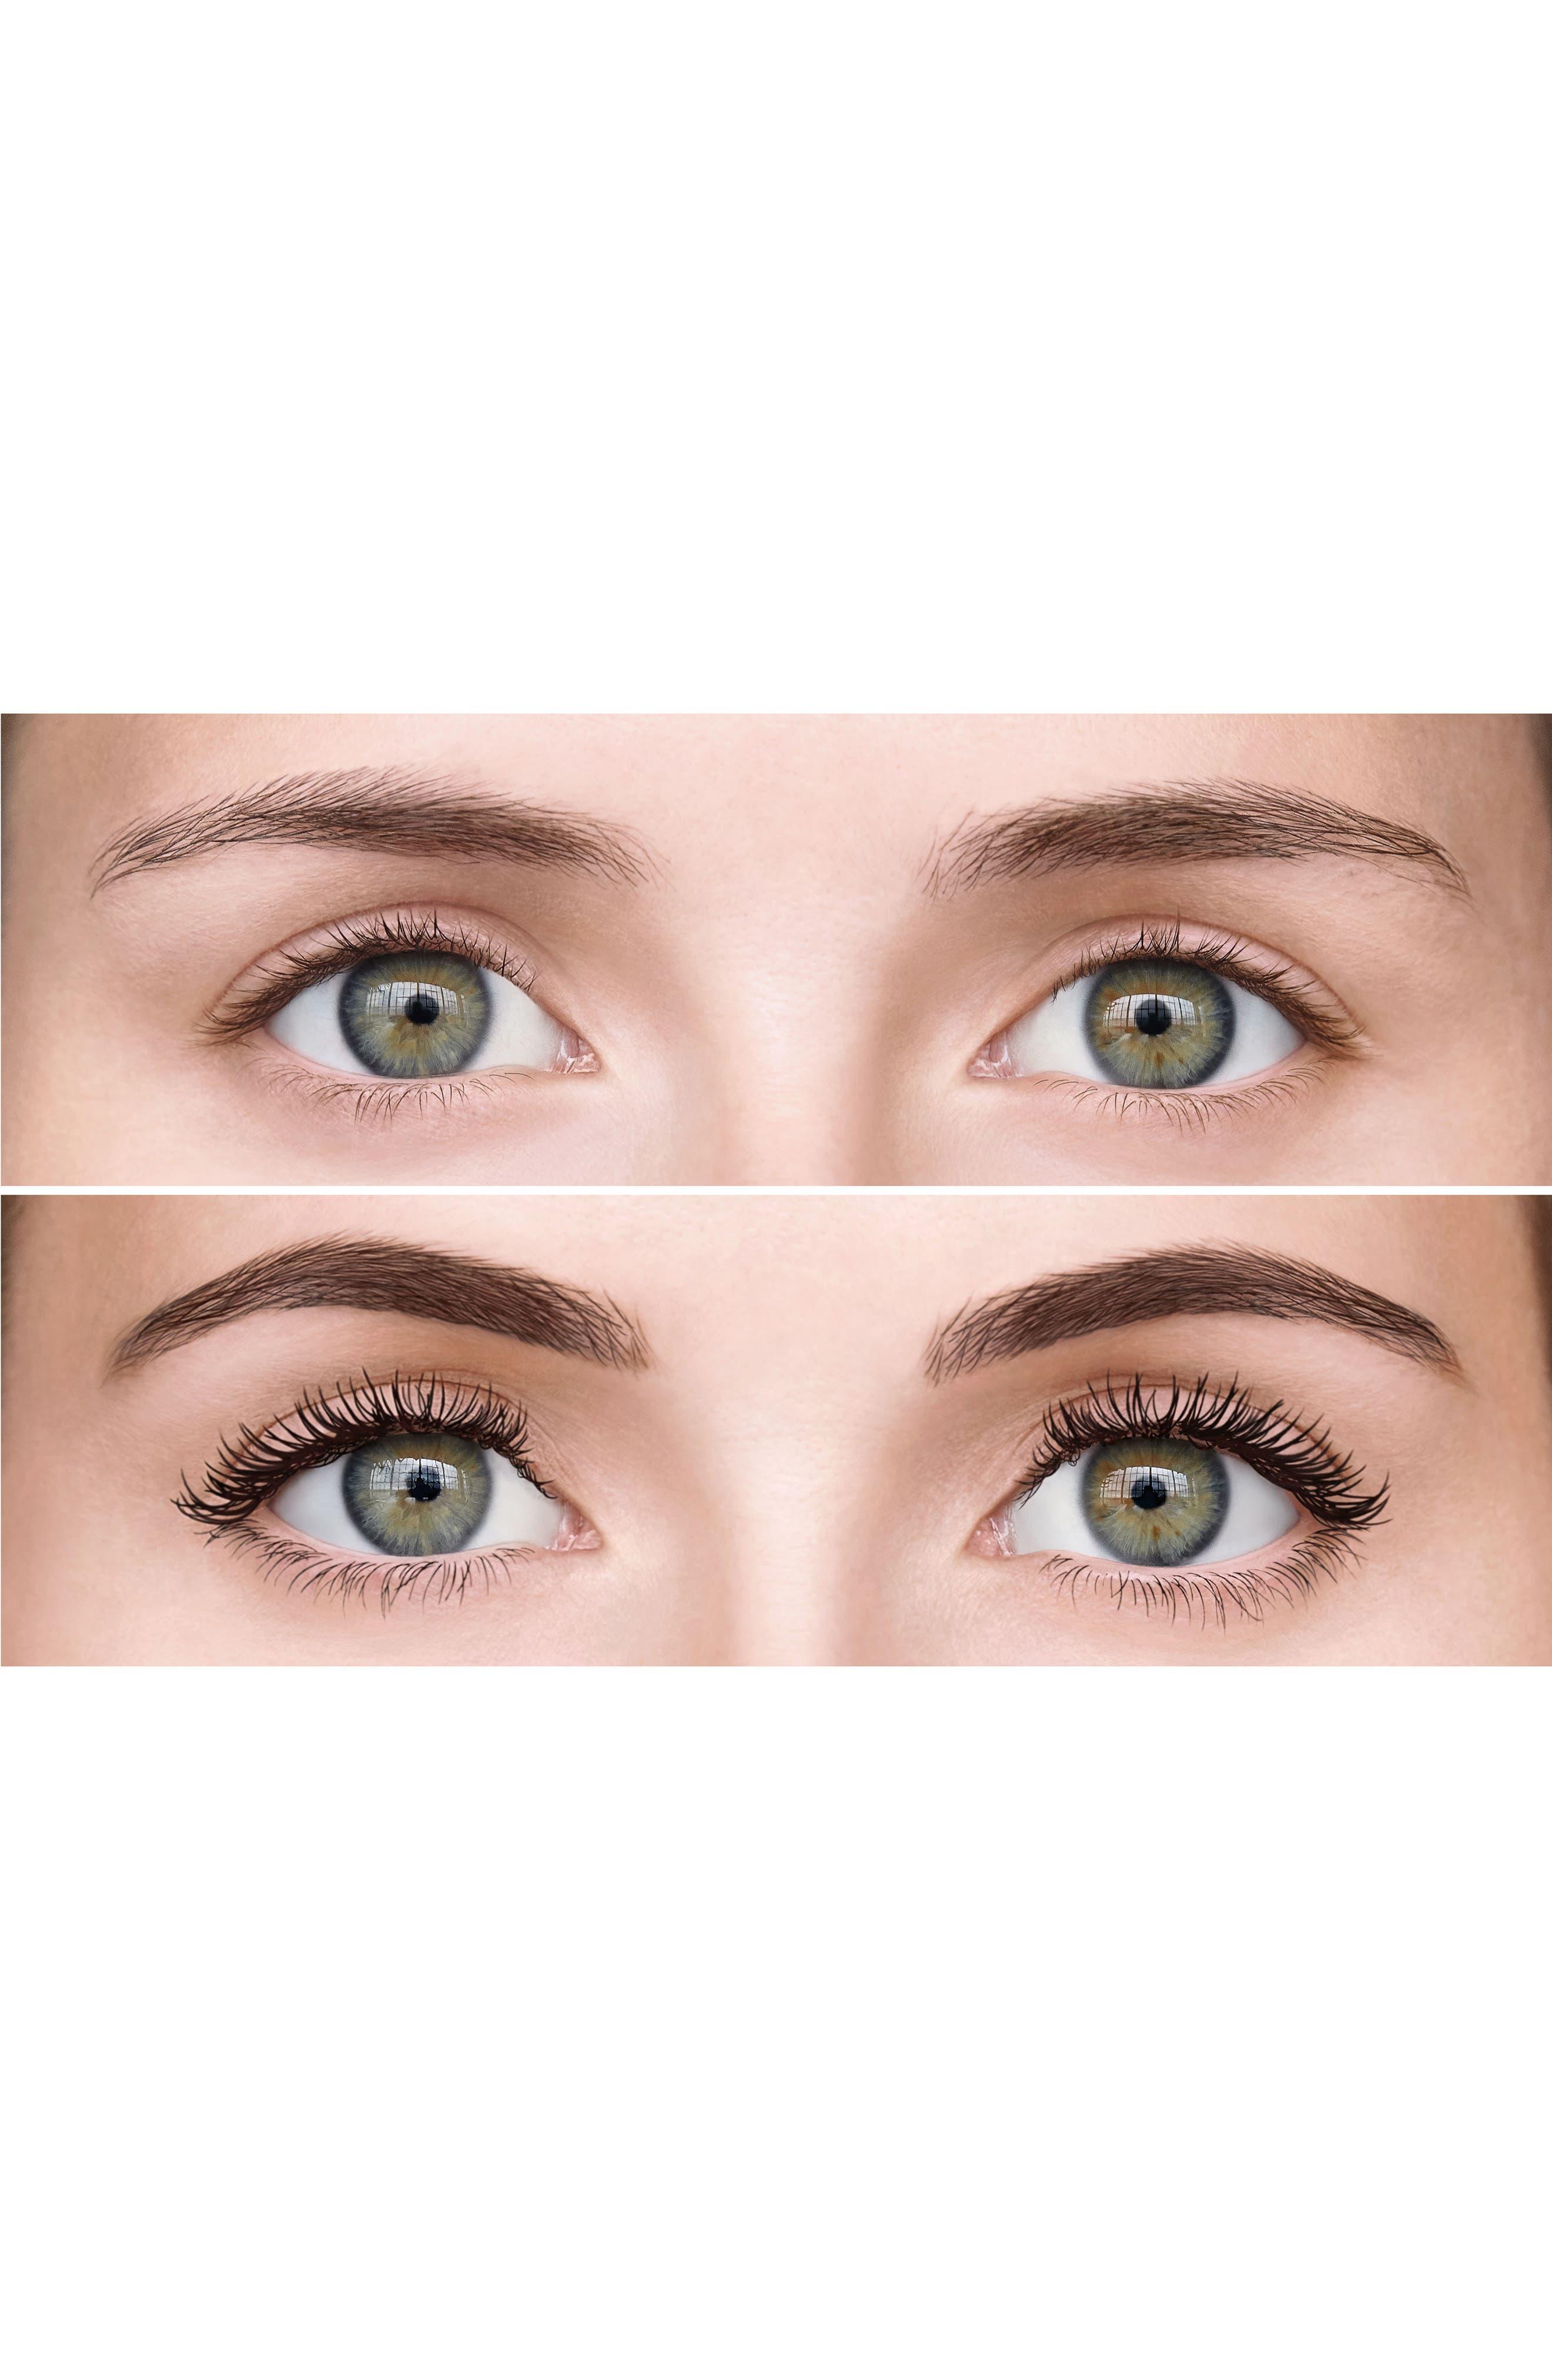 Pro Palette Eyebrow Kit,                             Alternate thumbnail 2, color,                             000